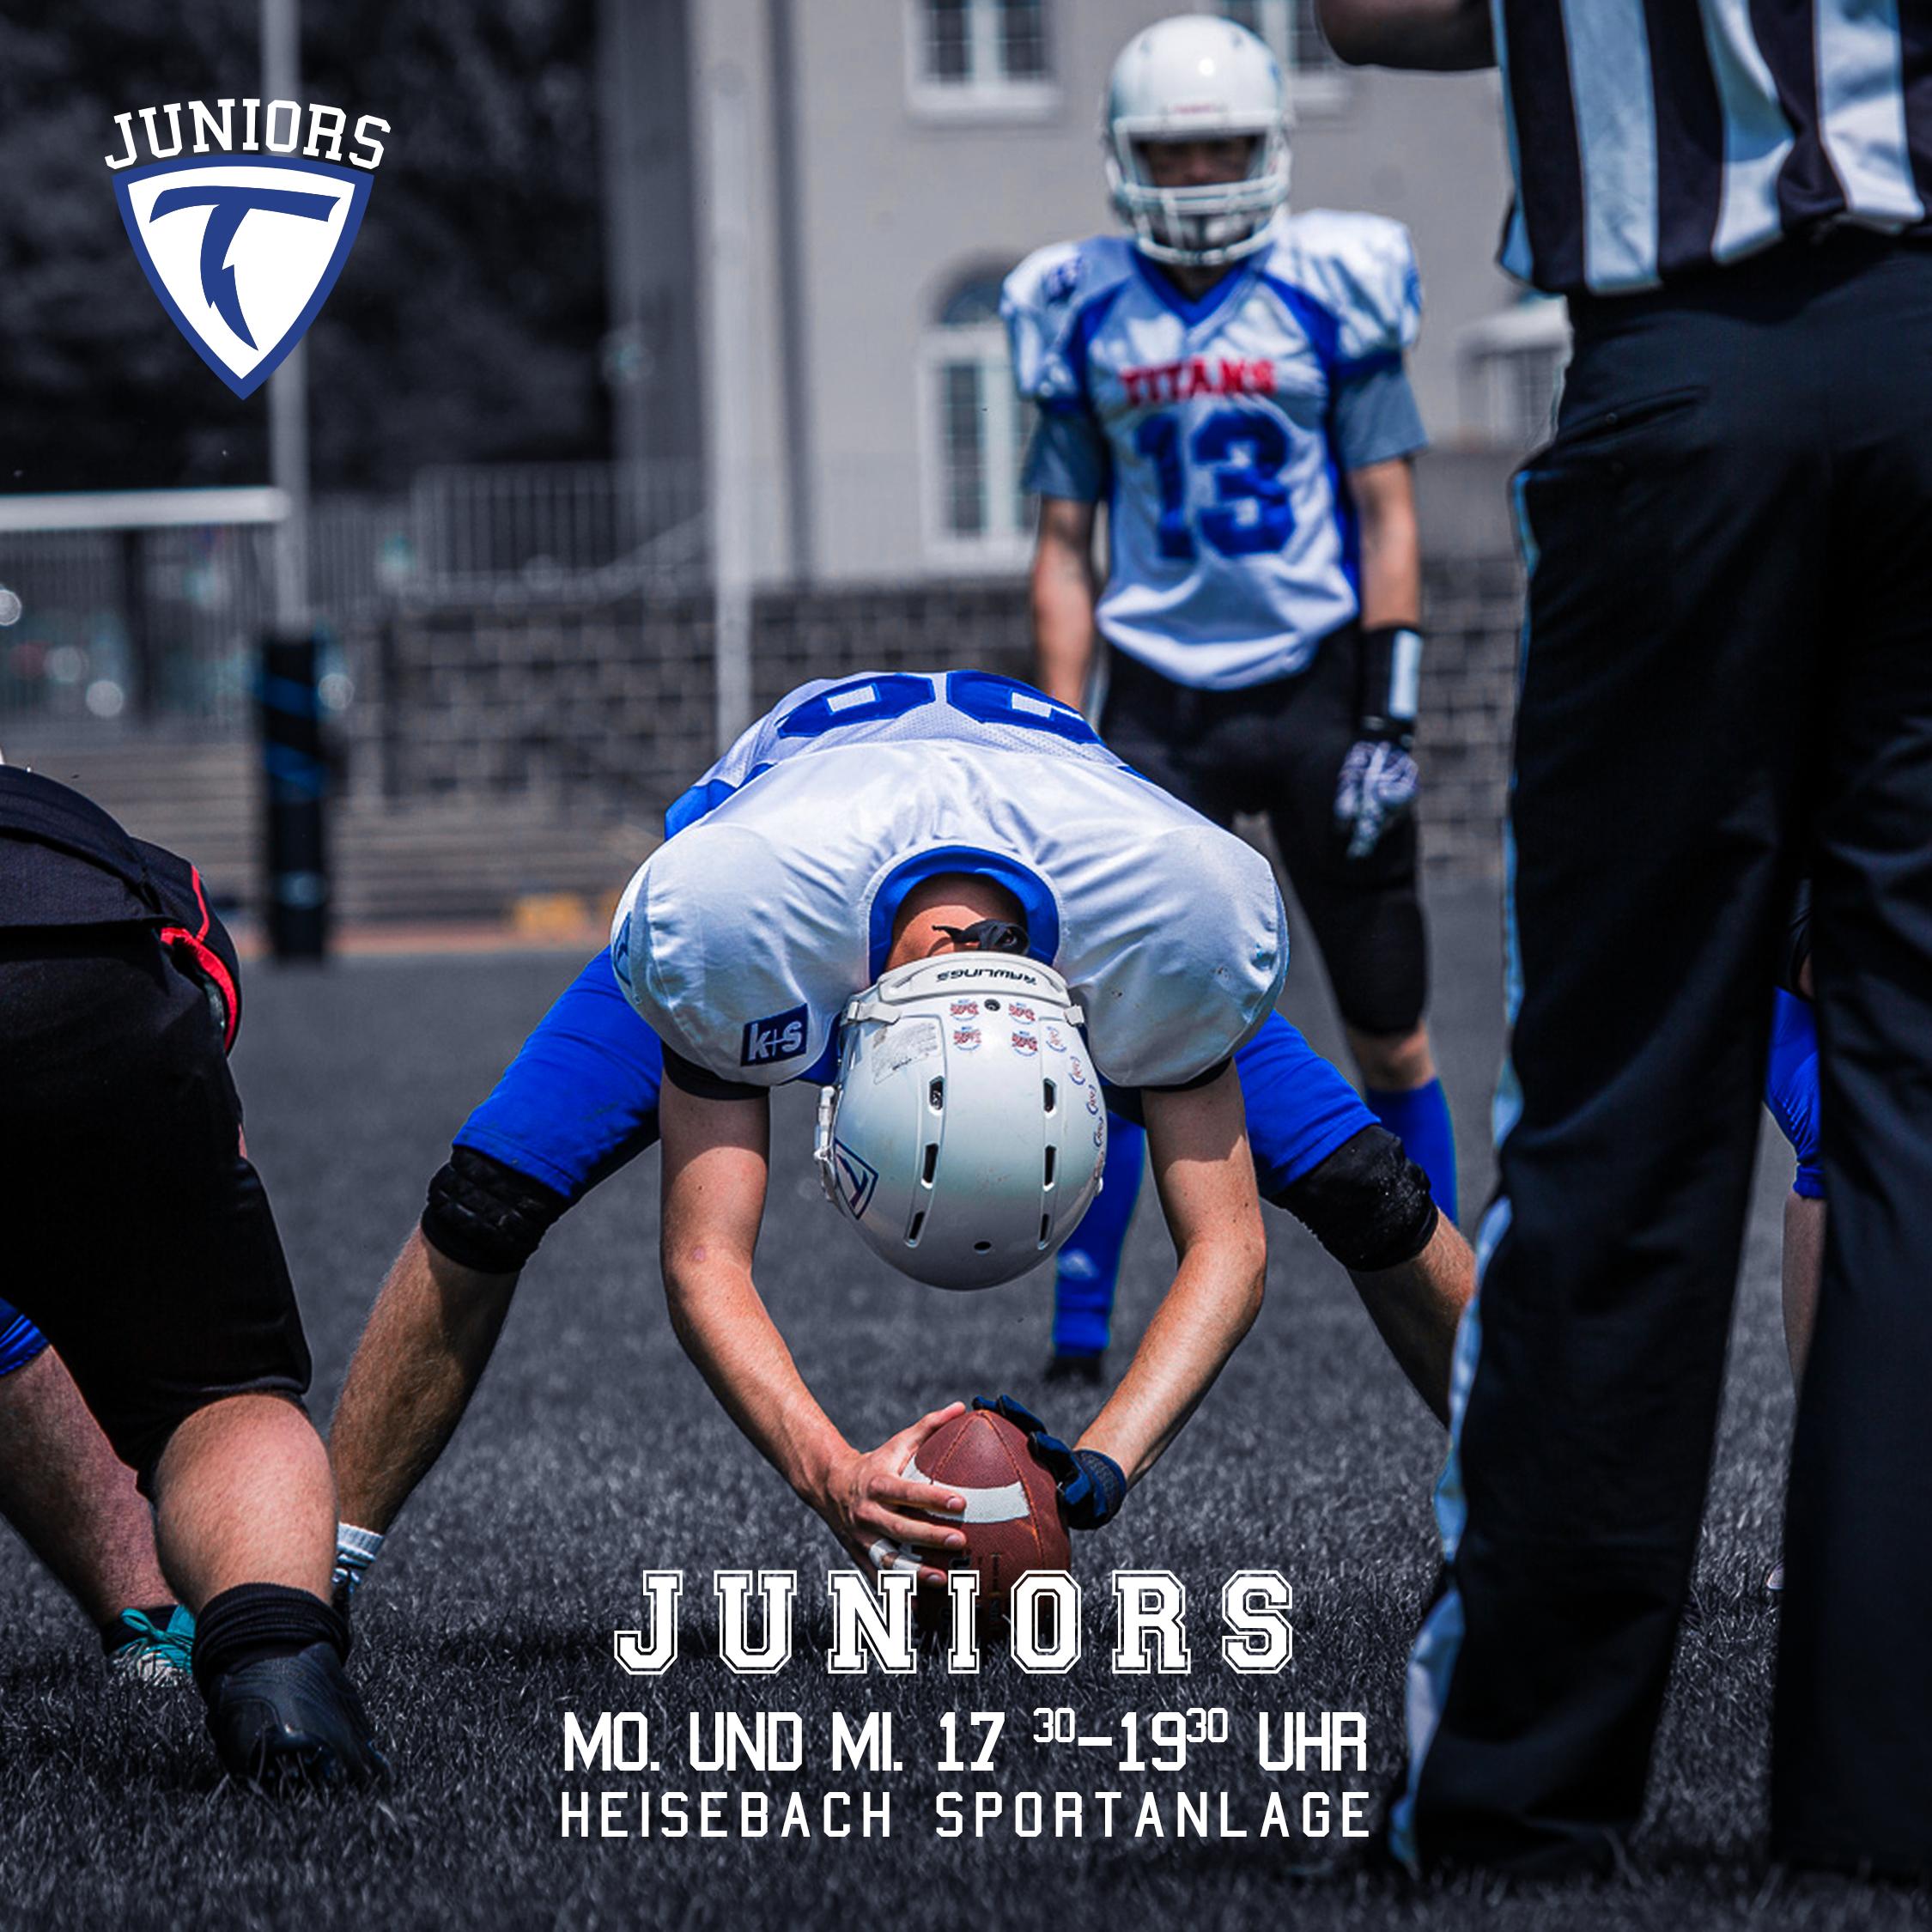 Neue Trainingszeiten der Juniors U16/U17/U19